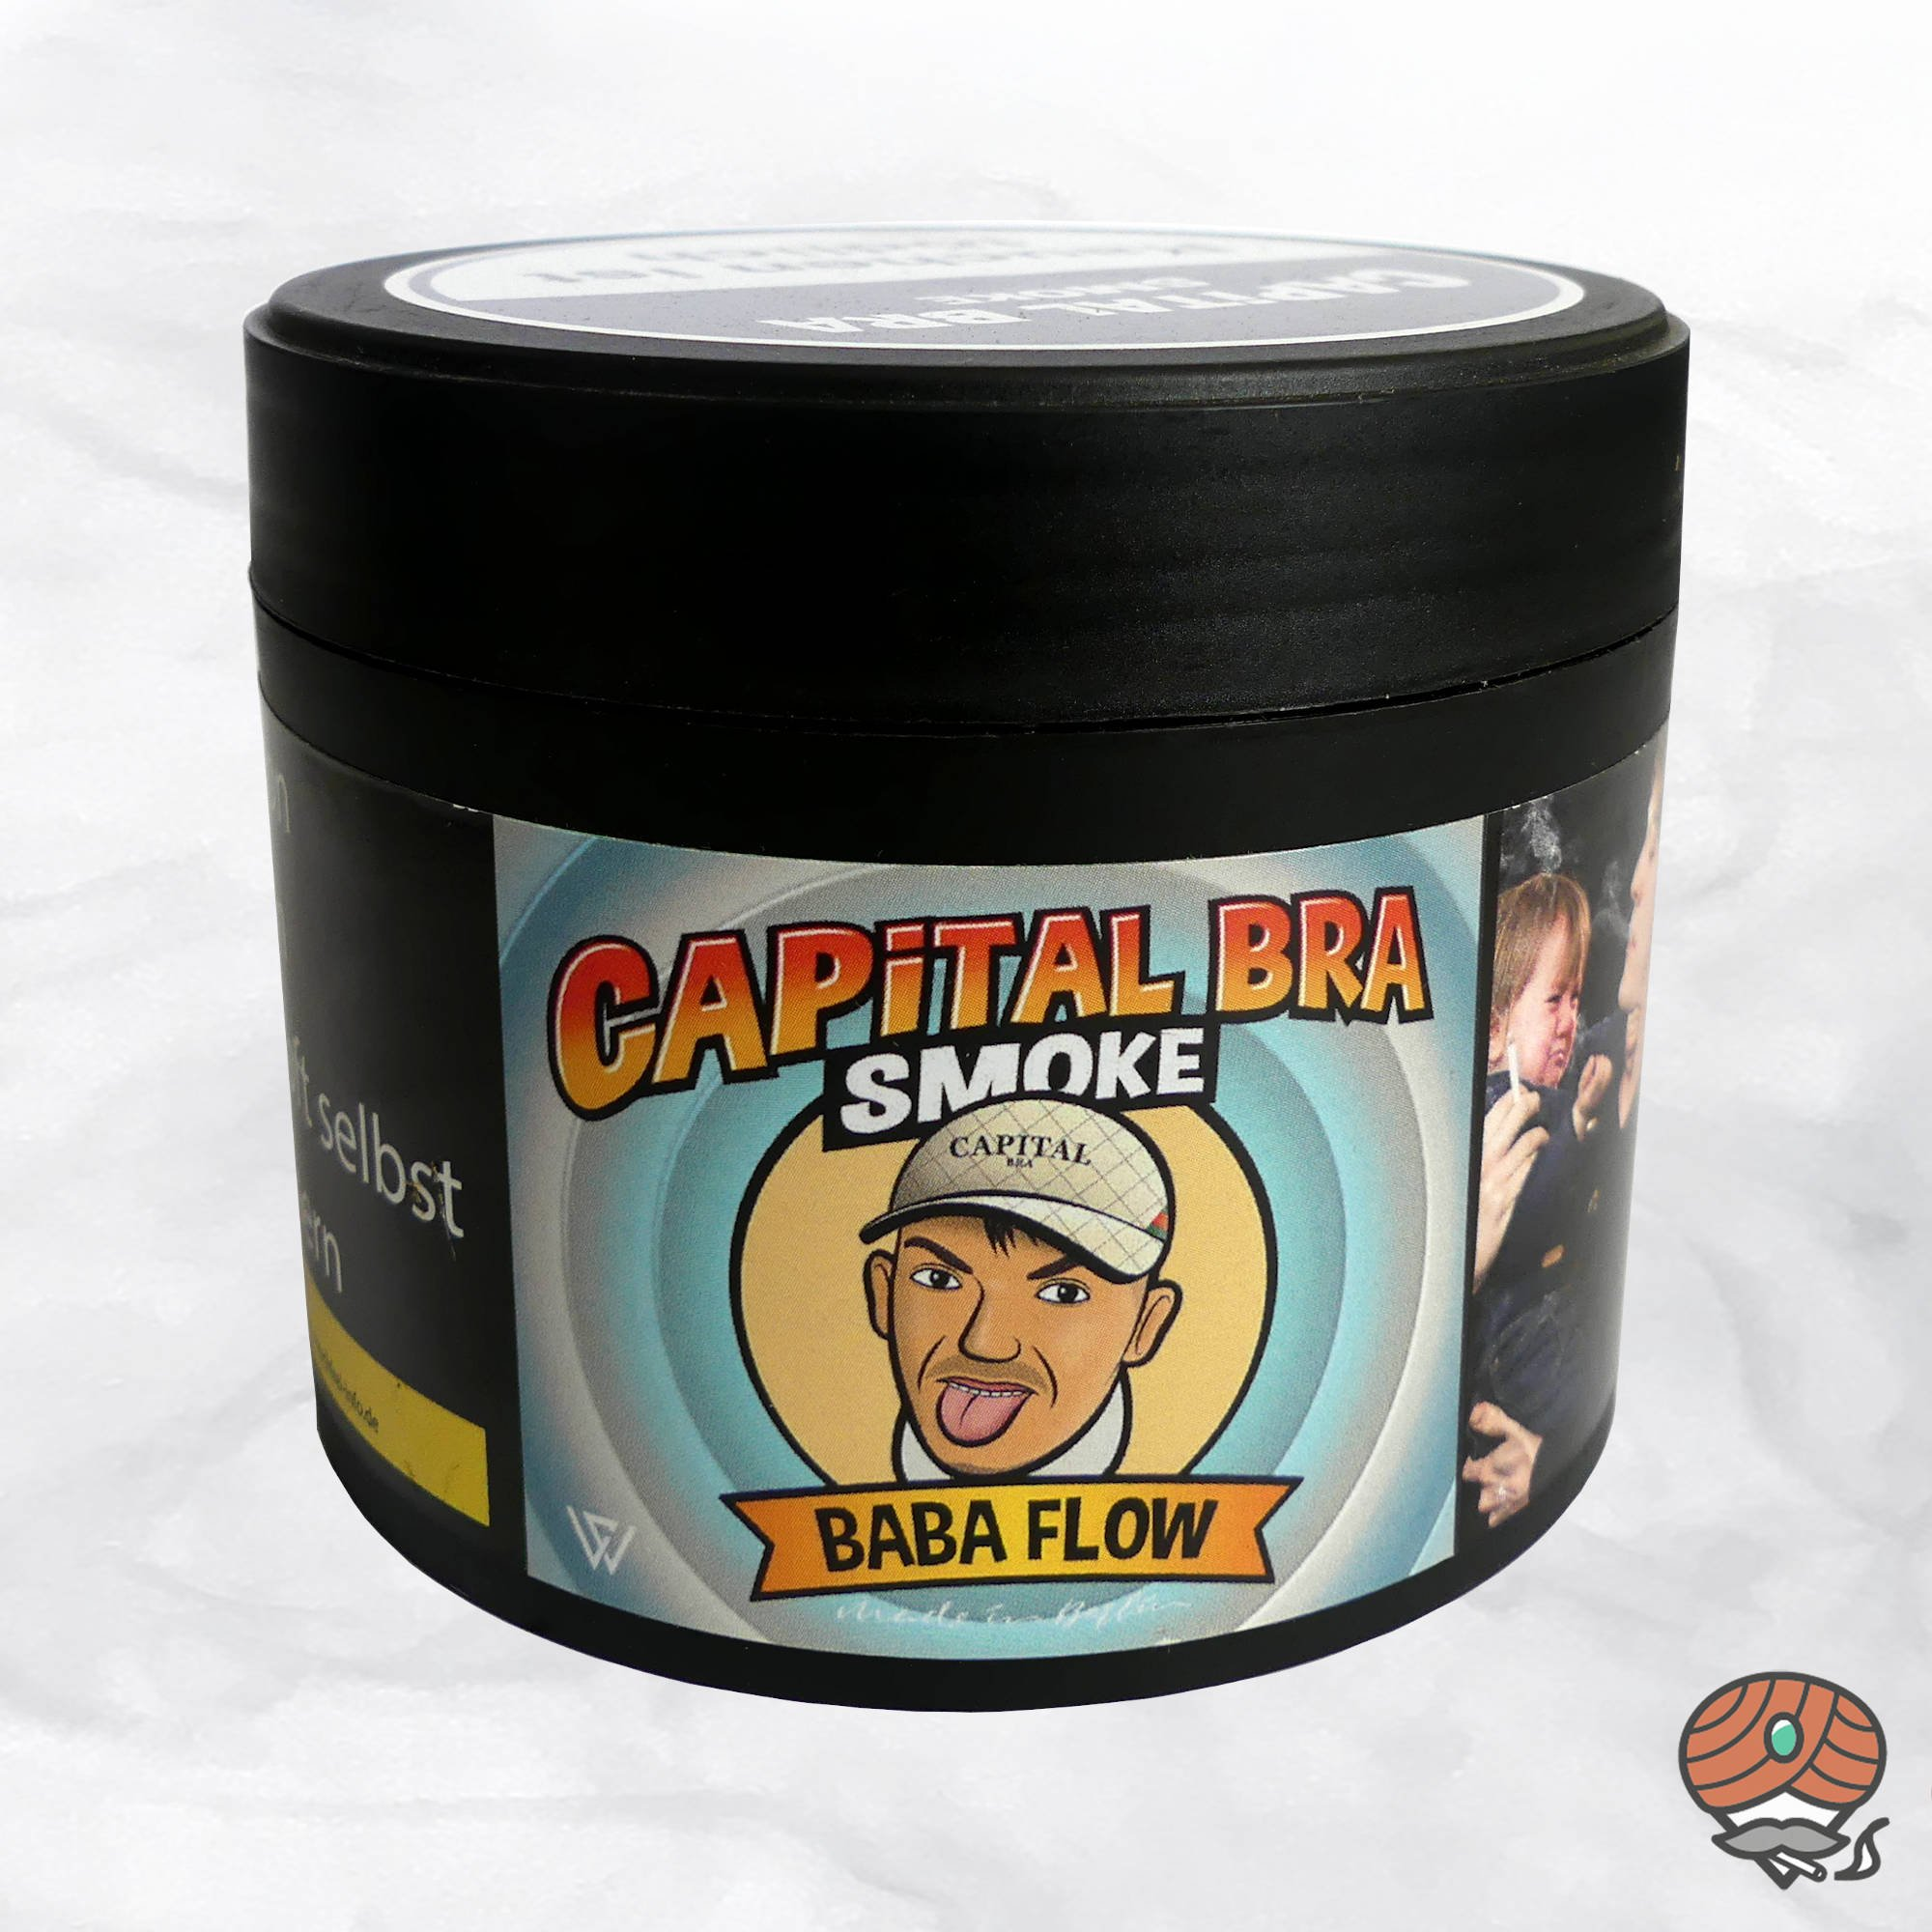 Capital Bra Smoke Shisha Tabak - Baba Flow 200g